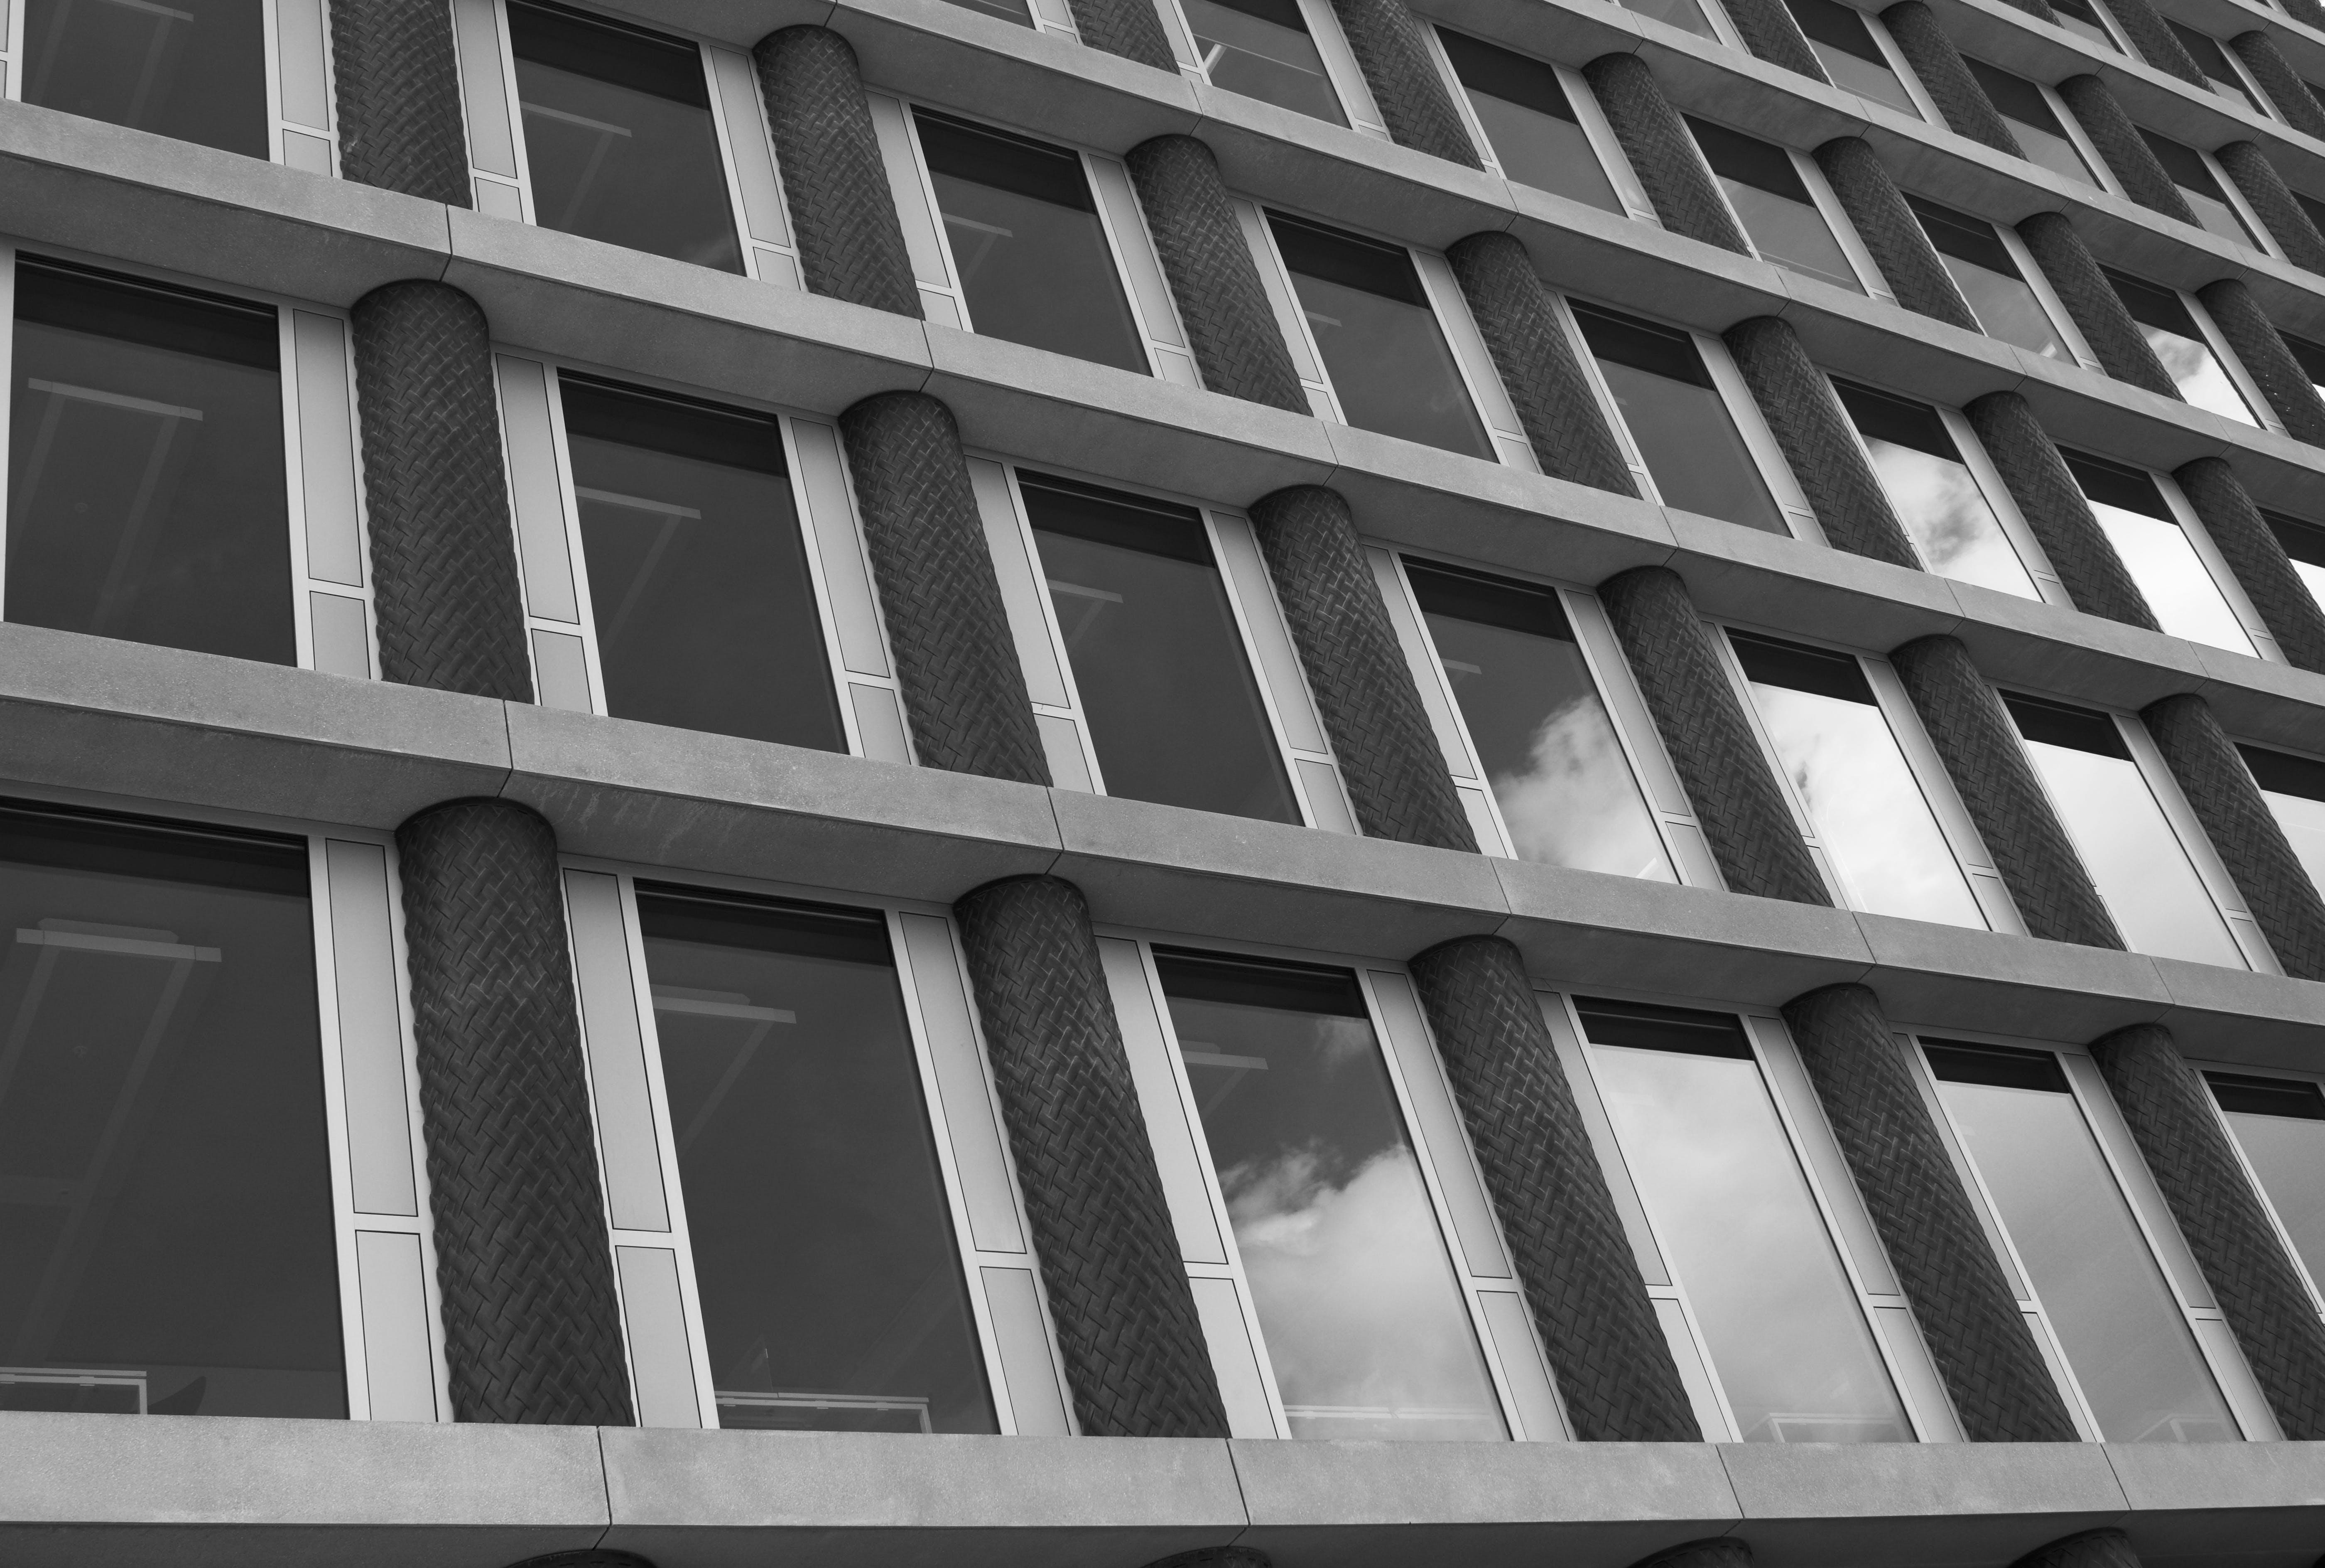 architektura, budova, černobílý